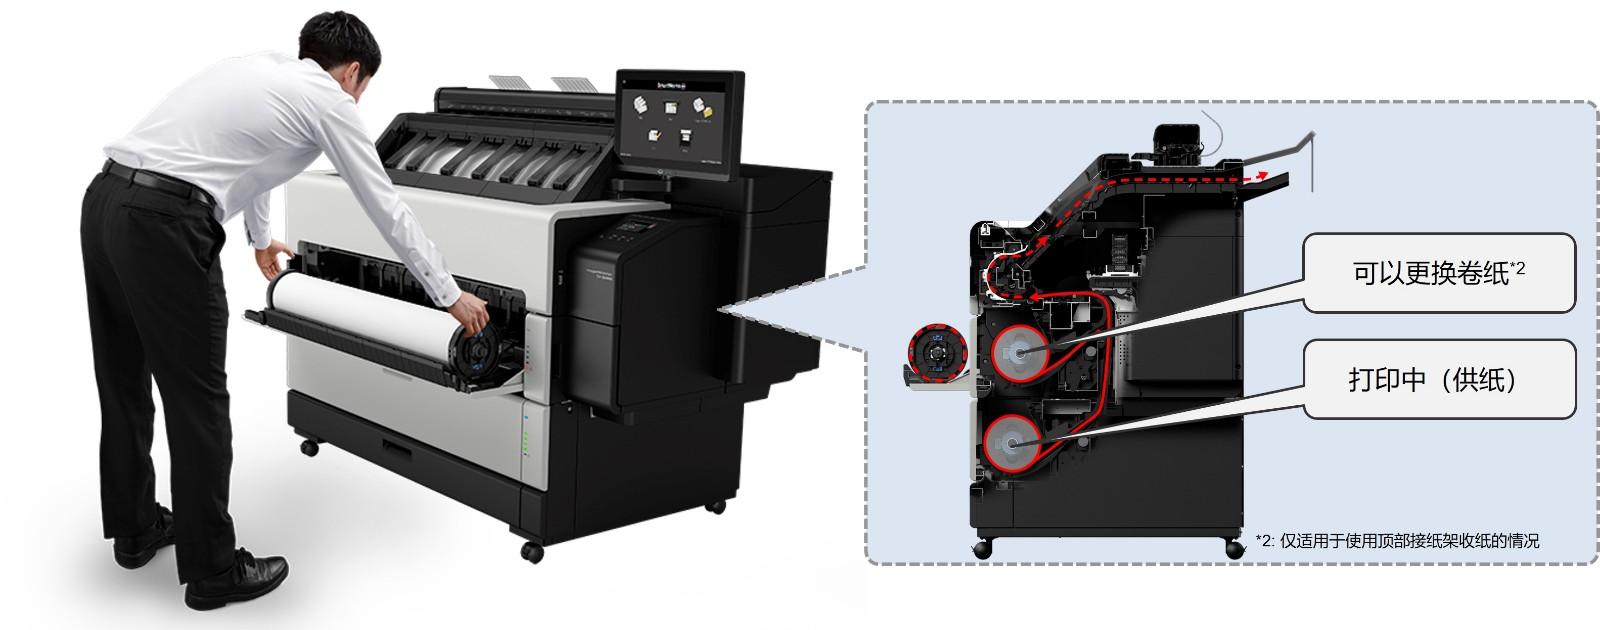 "5.imagePROGRAFTZ-53005300MFP首次搭载了""卷纸热插拔更换""技术.jpg"